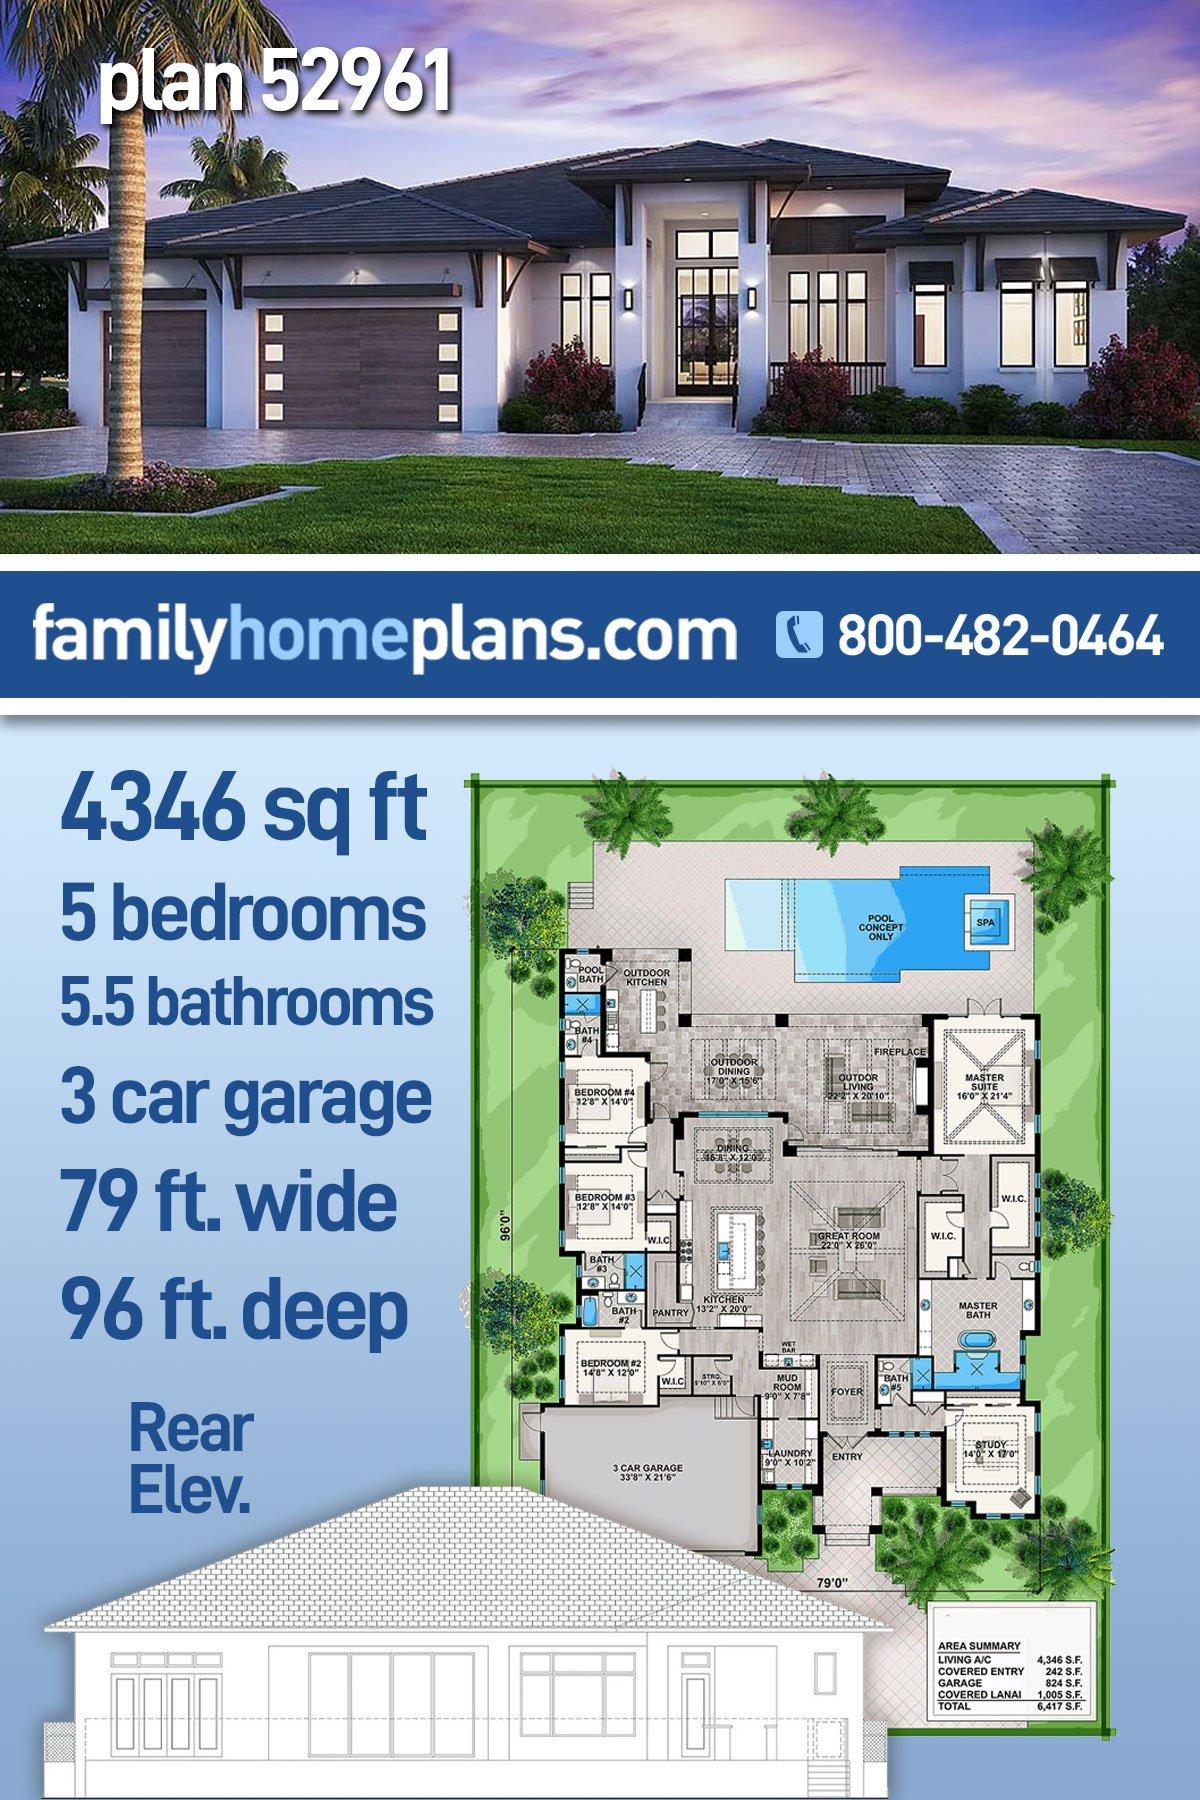 Coastal, Contemporary, Florida House Plan 52961 with 5 Beds, 6 Baths, 3 Car Garage